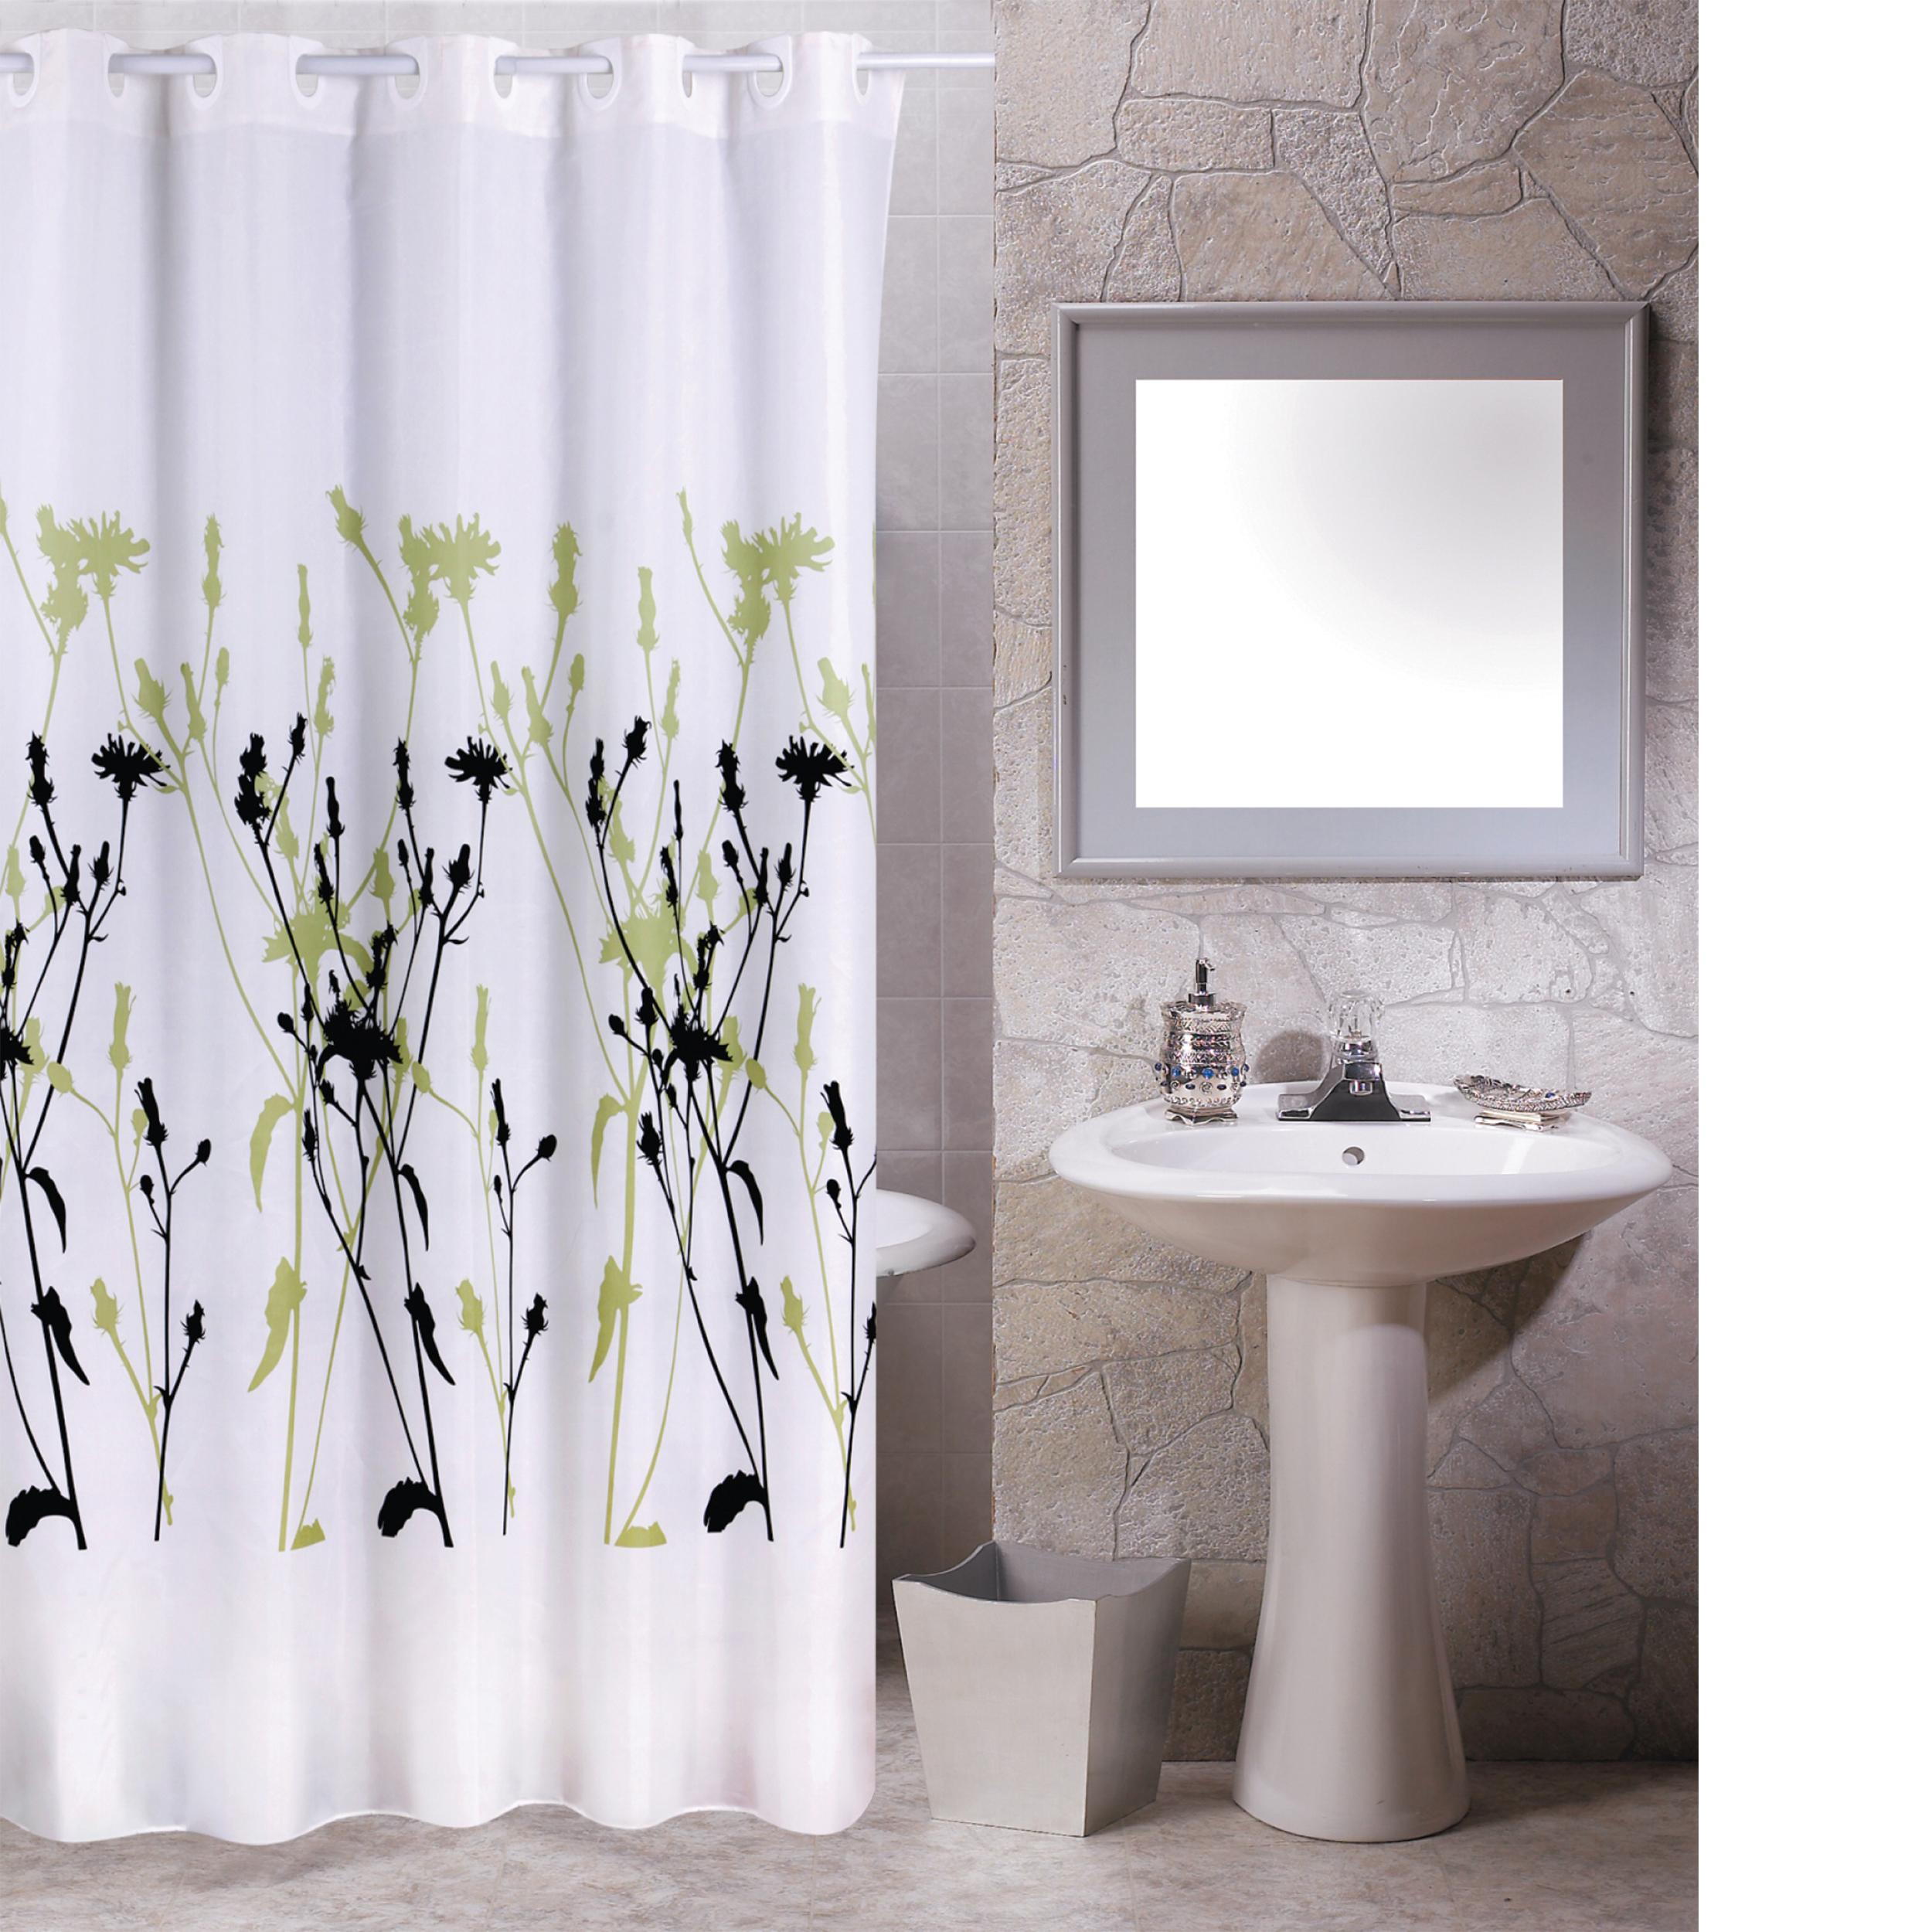 MSV Duschvorhang 180x200cm Anti Schimmel Textil Badewannenvorhang Wannenvorhang Blumen Grün